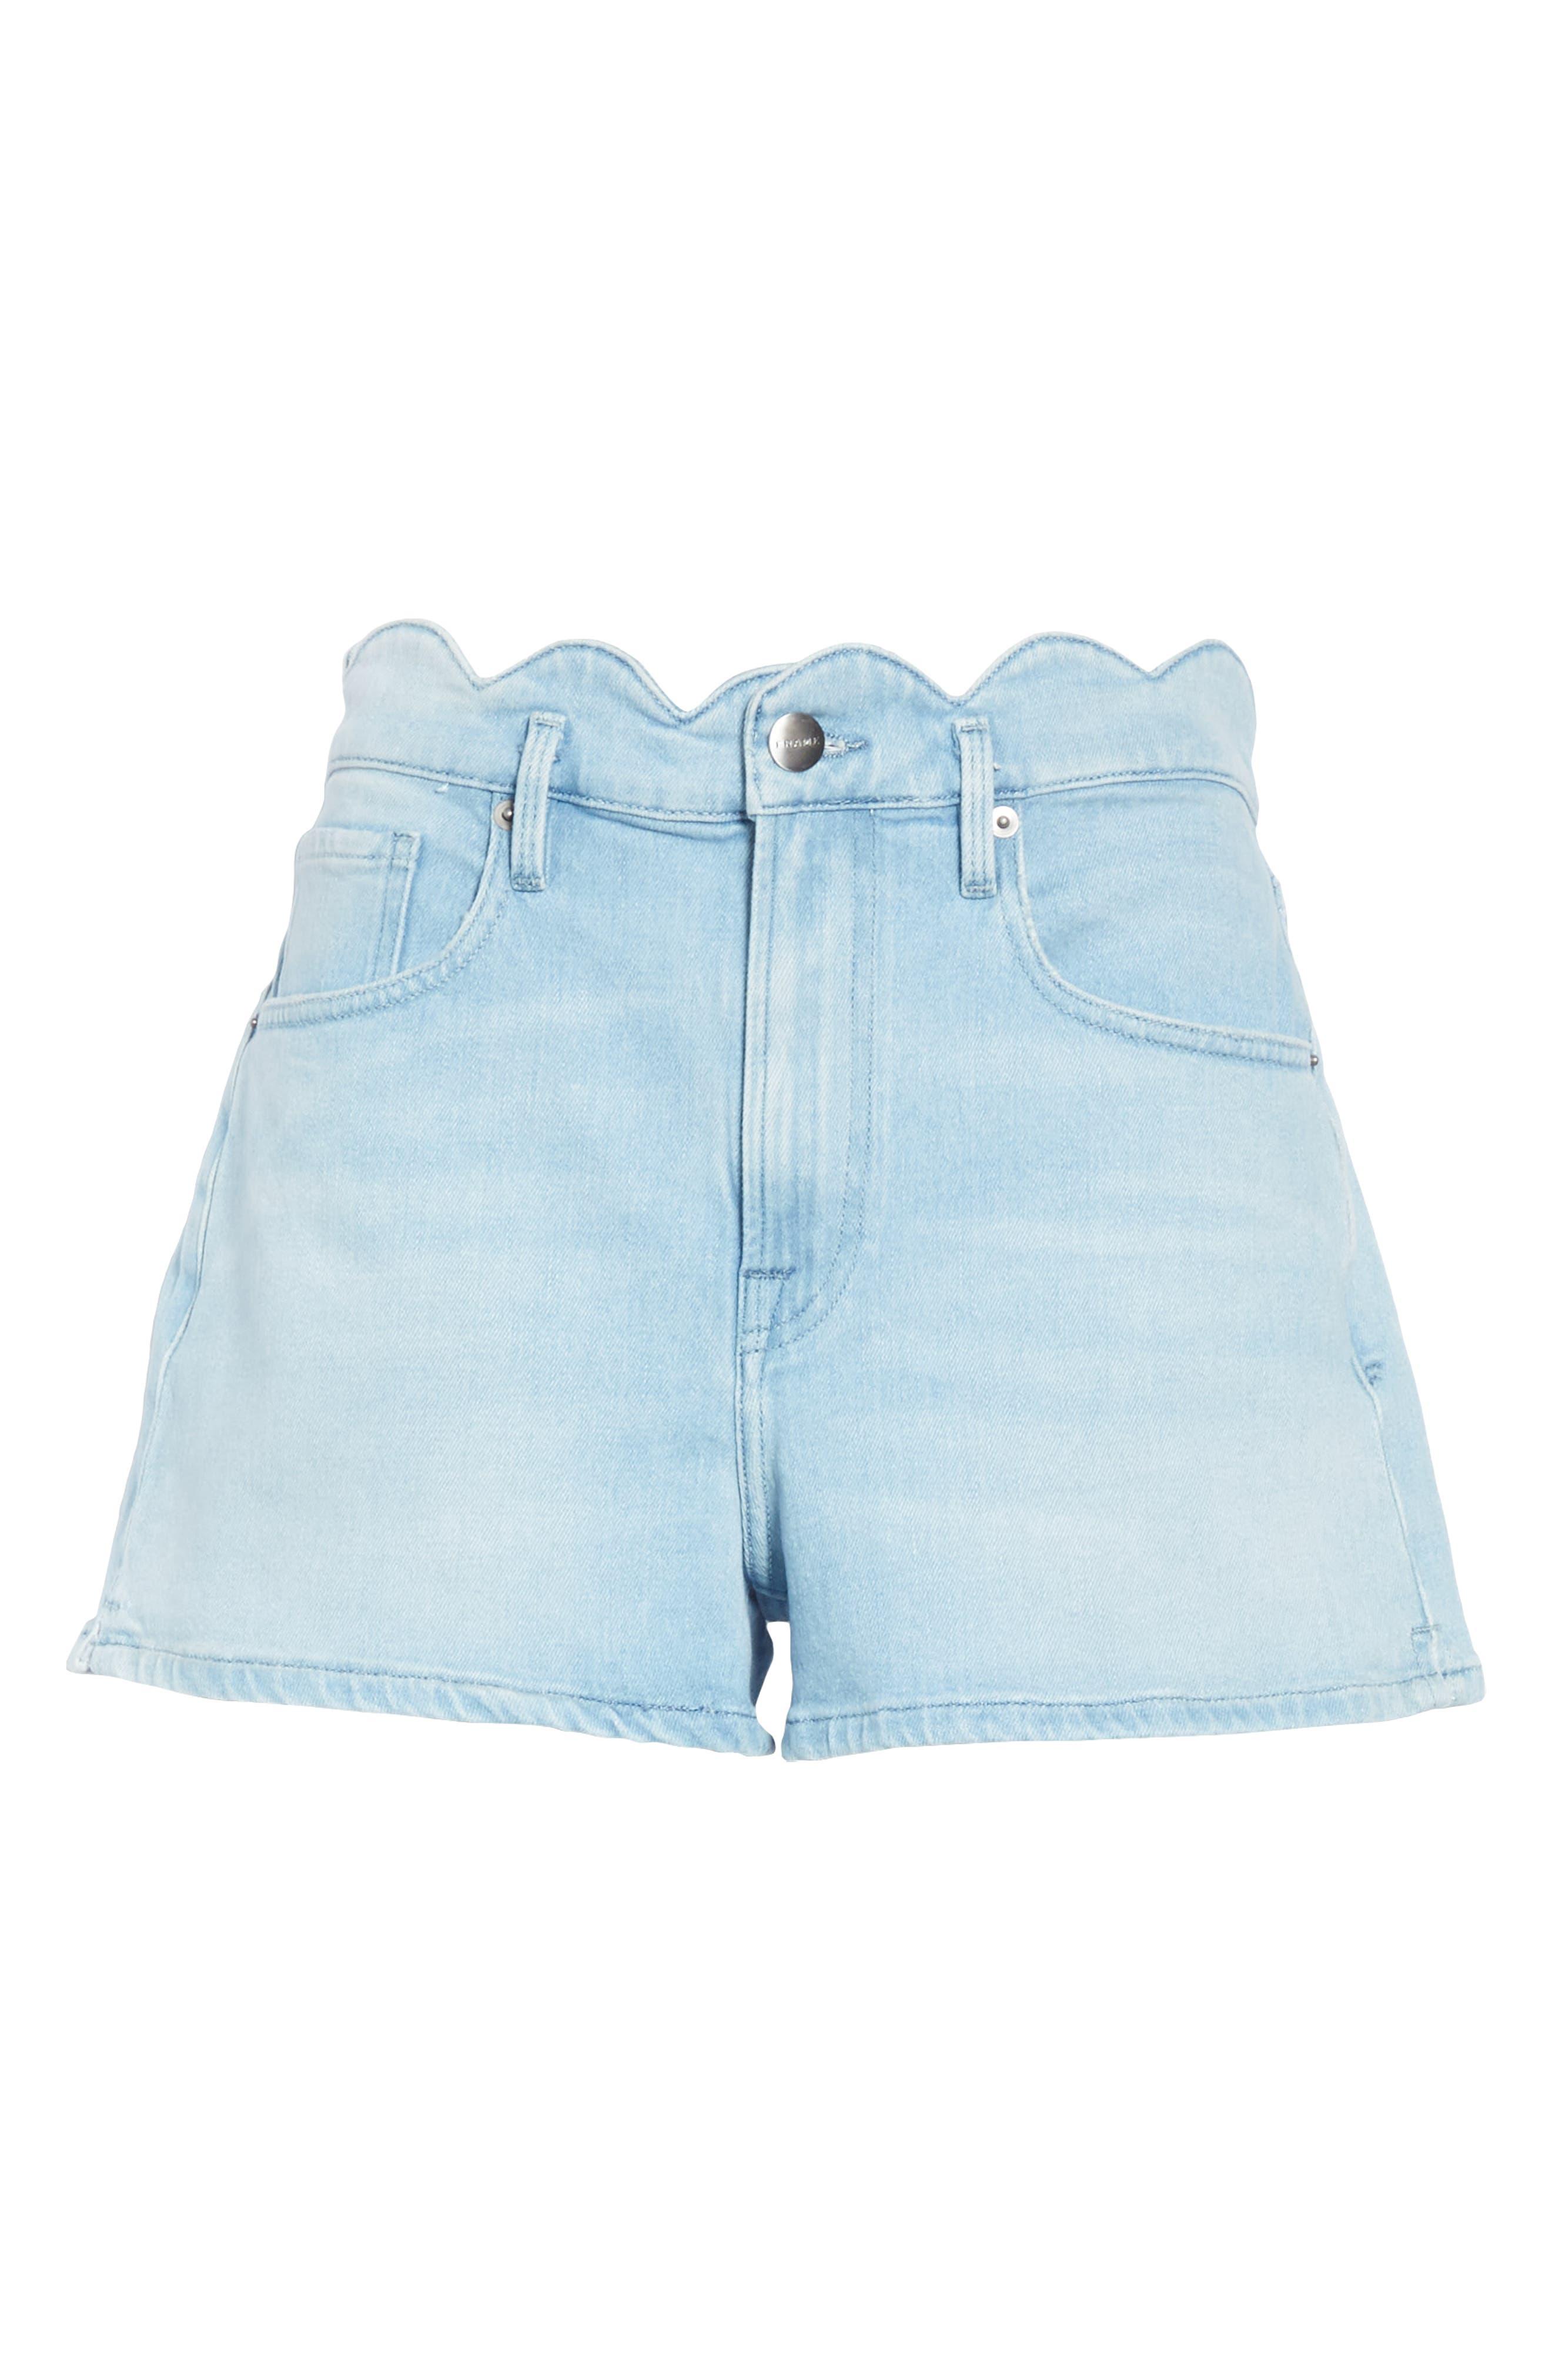 Scallop Waist Denim Shorts,                             Alternate thumbnail 6, color,                             WRIGHT